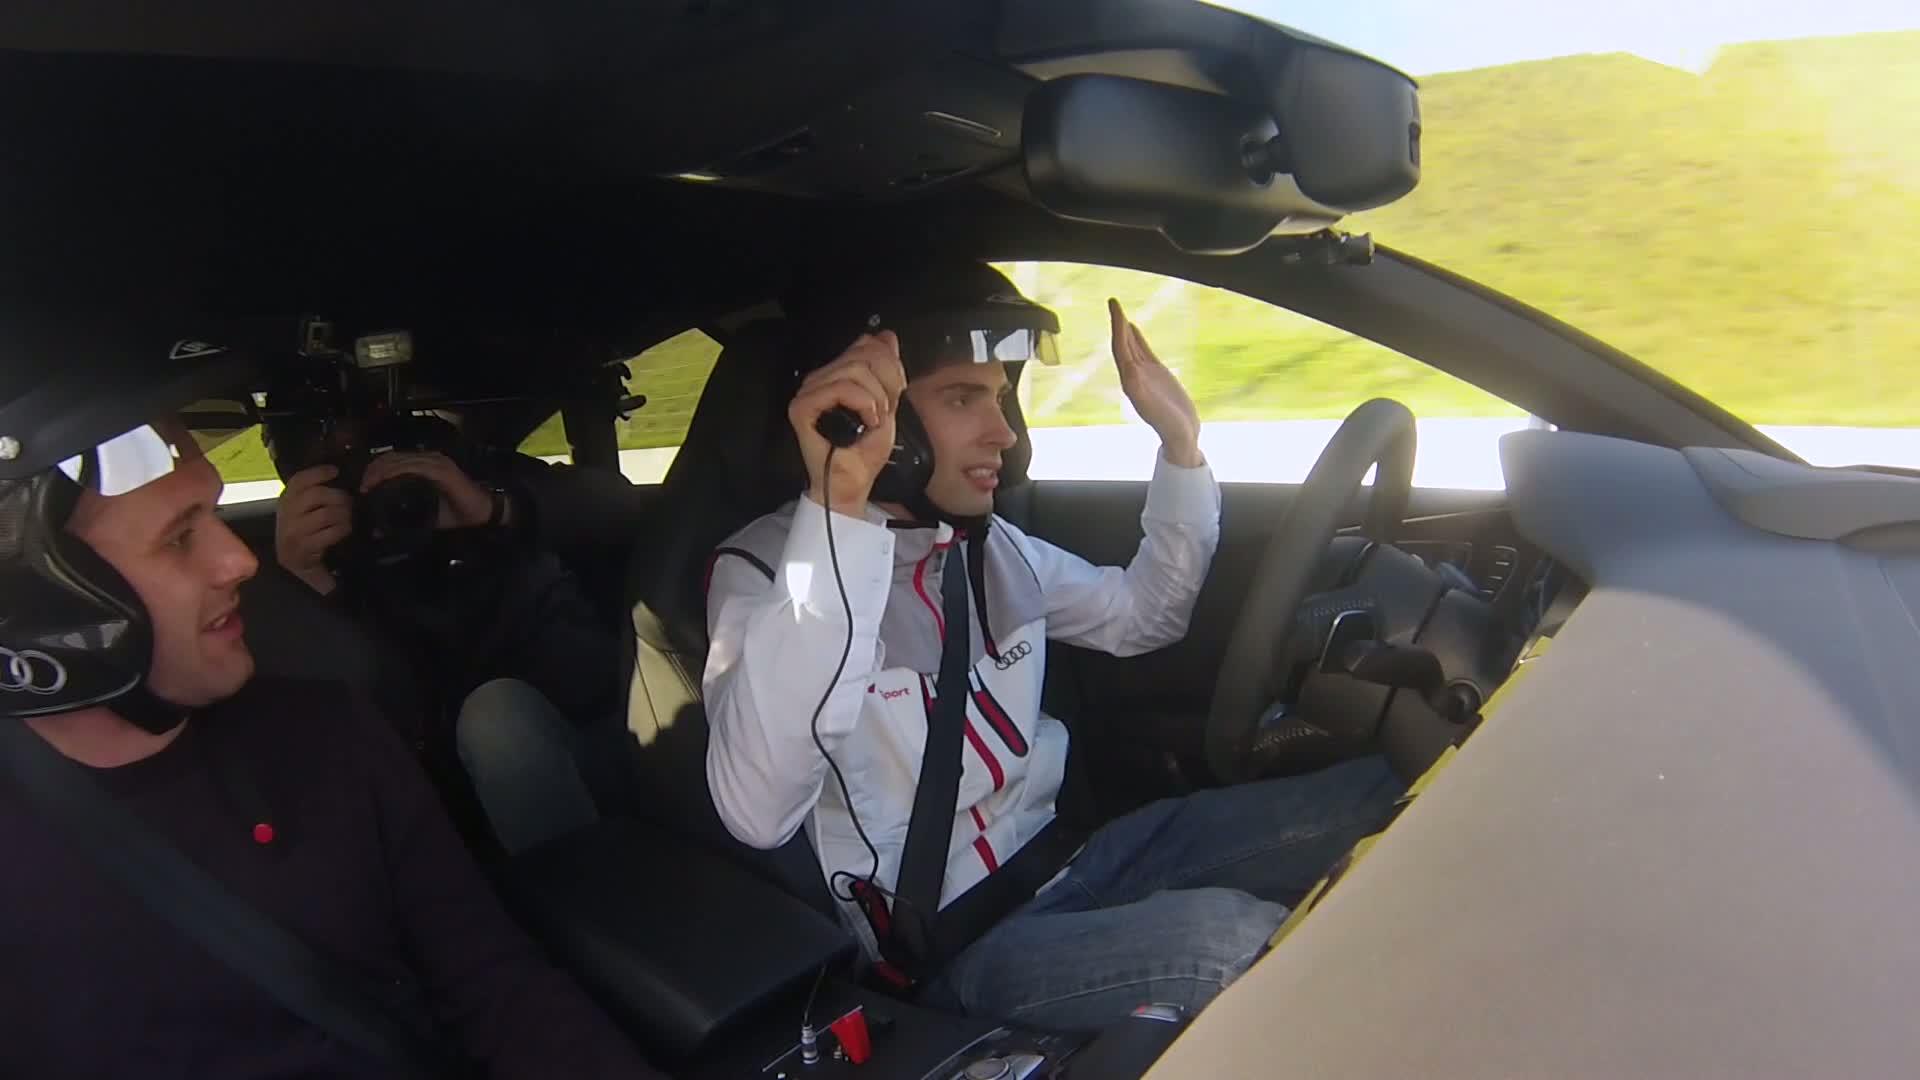 Vorab getestet: Audi RS 7 piloted driving concept